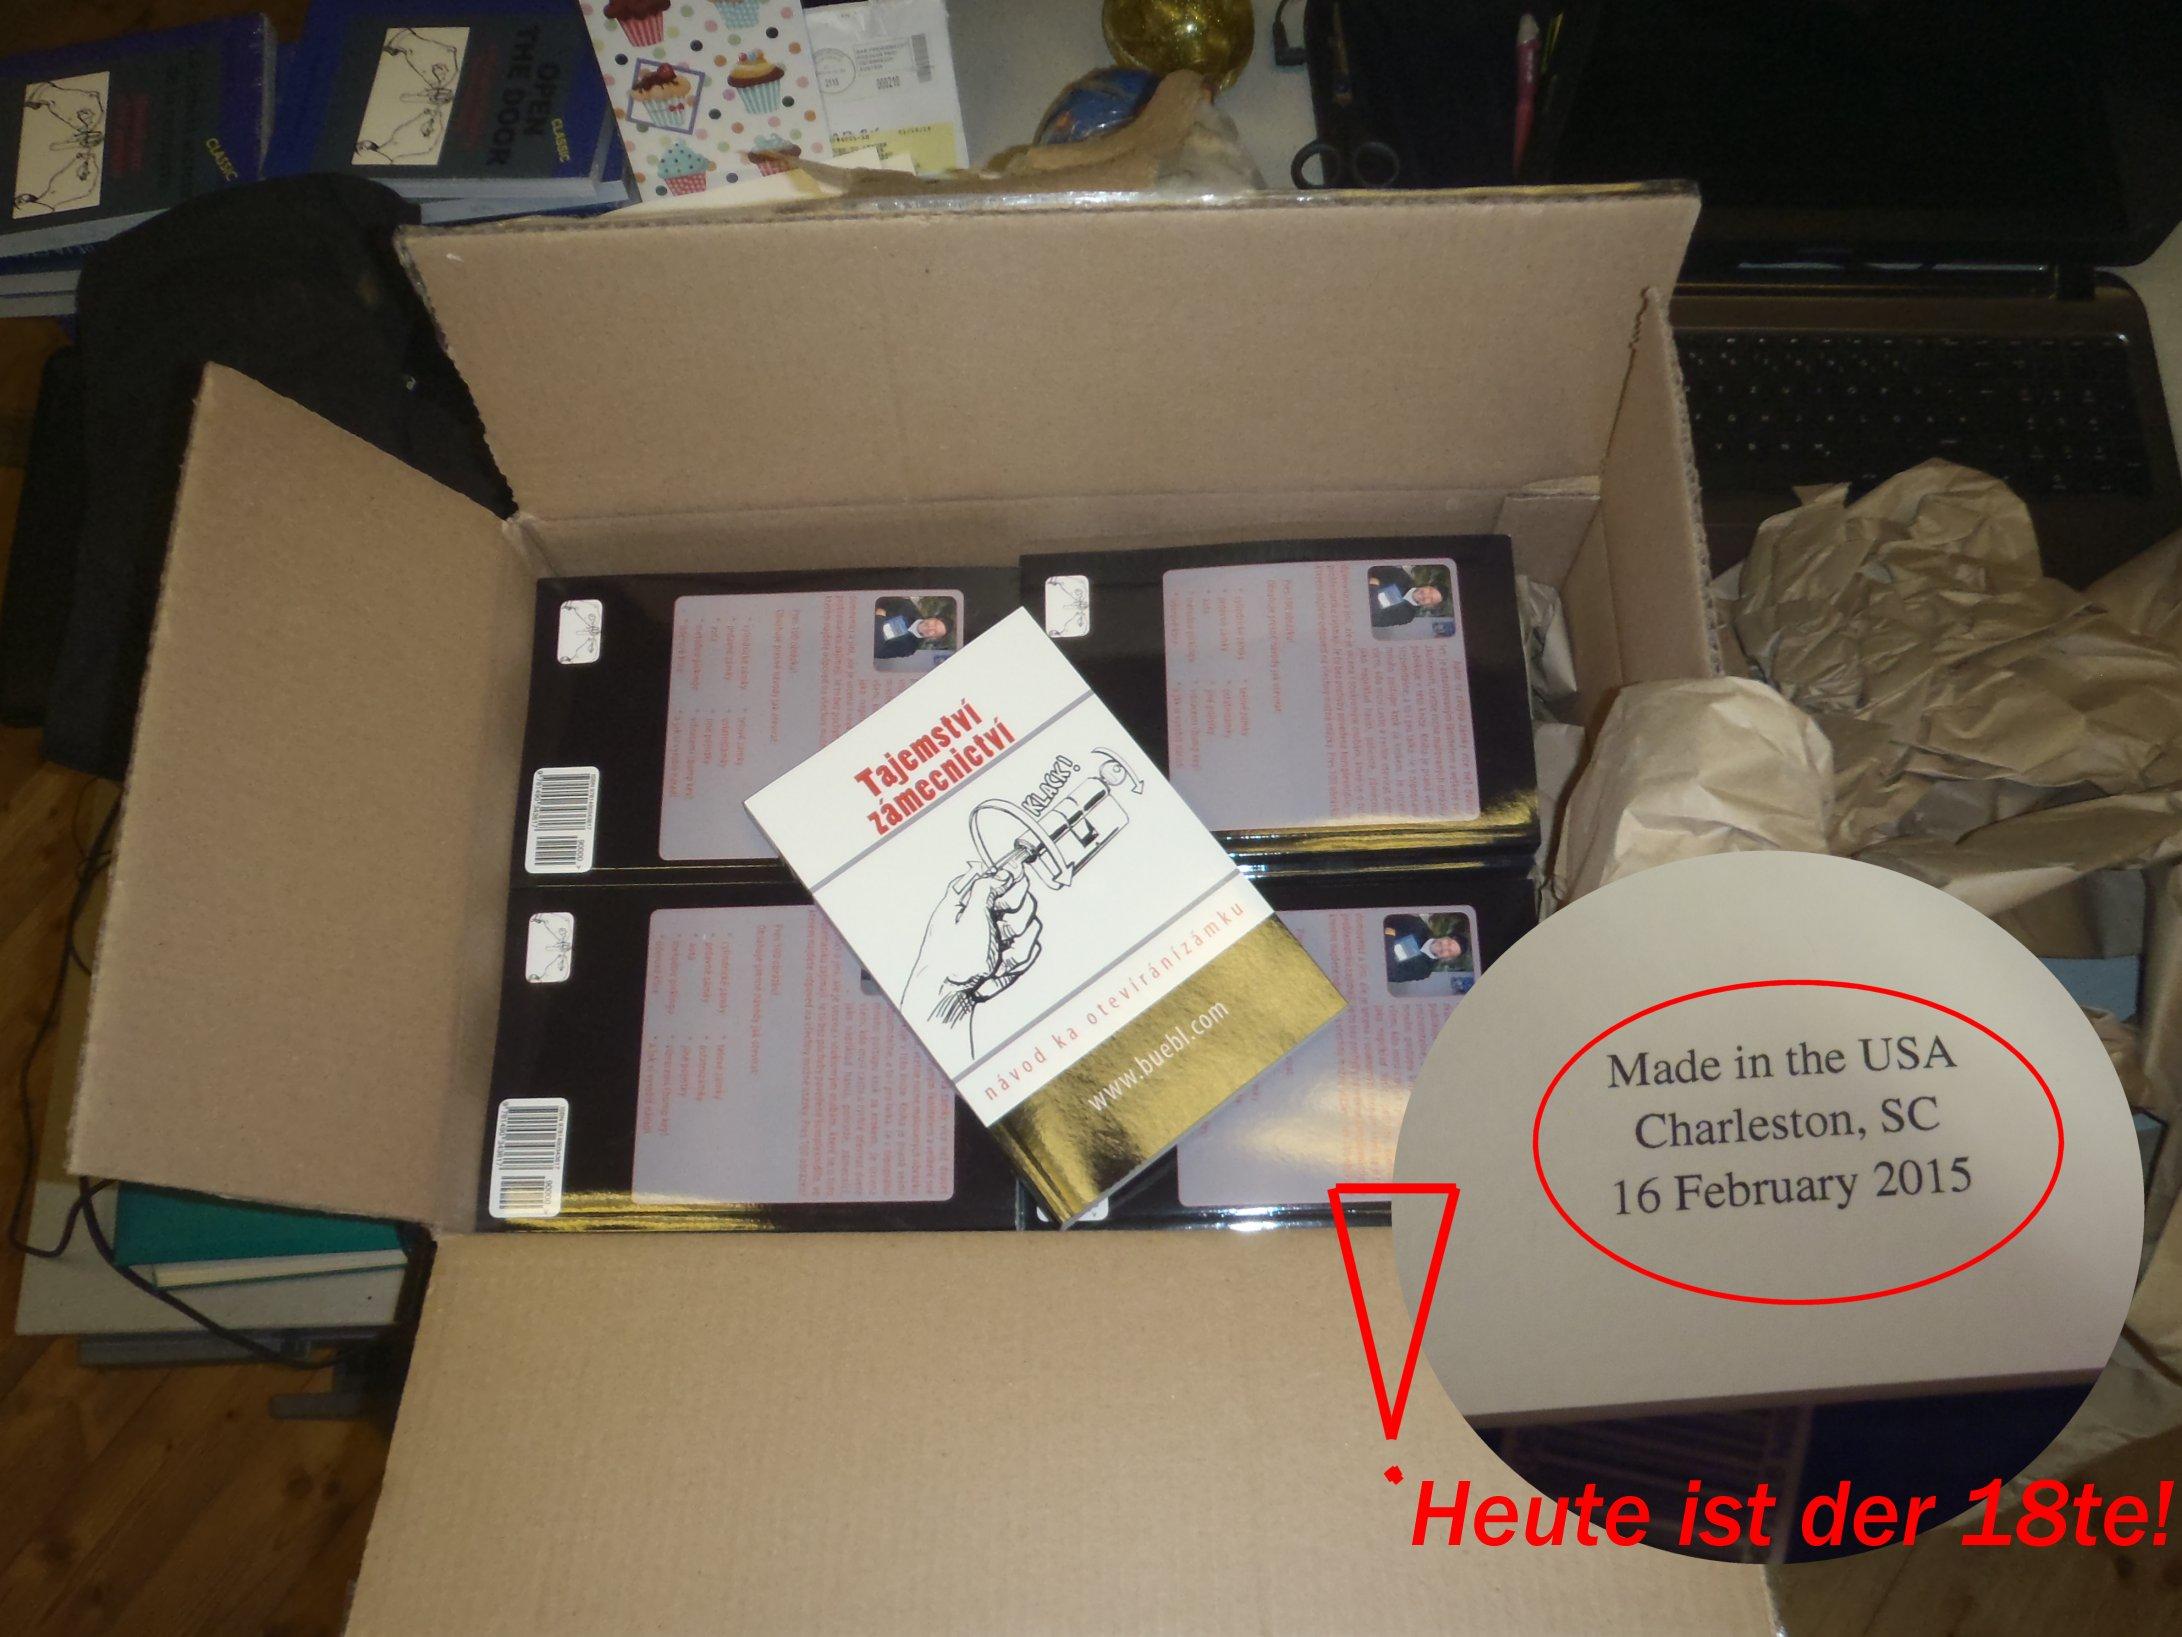 Ein karton Bücher in tschechischer Sprache Am 15ten Februar 1015 bestellt Am 16ten Februar in South Carolina (USA!) gedruckt Am 18ten Februar 2015 beim mir im Schlossernaus geliefert. 10 000 Kilometer!